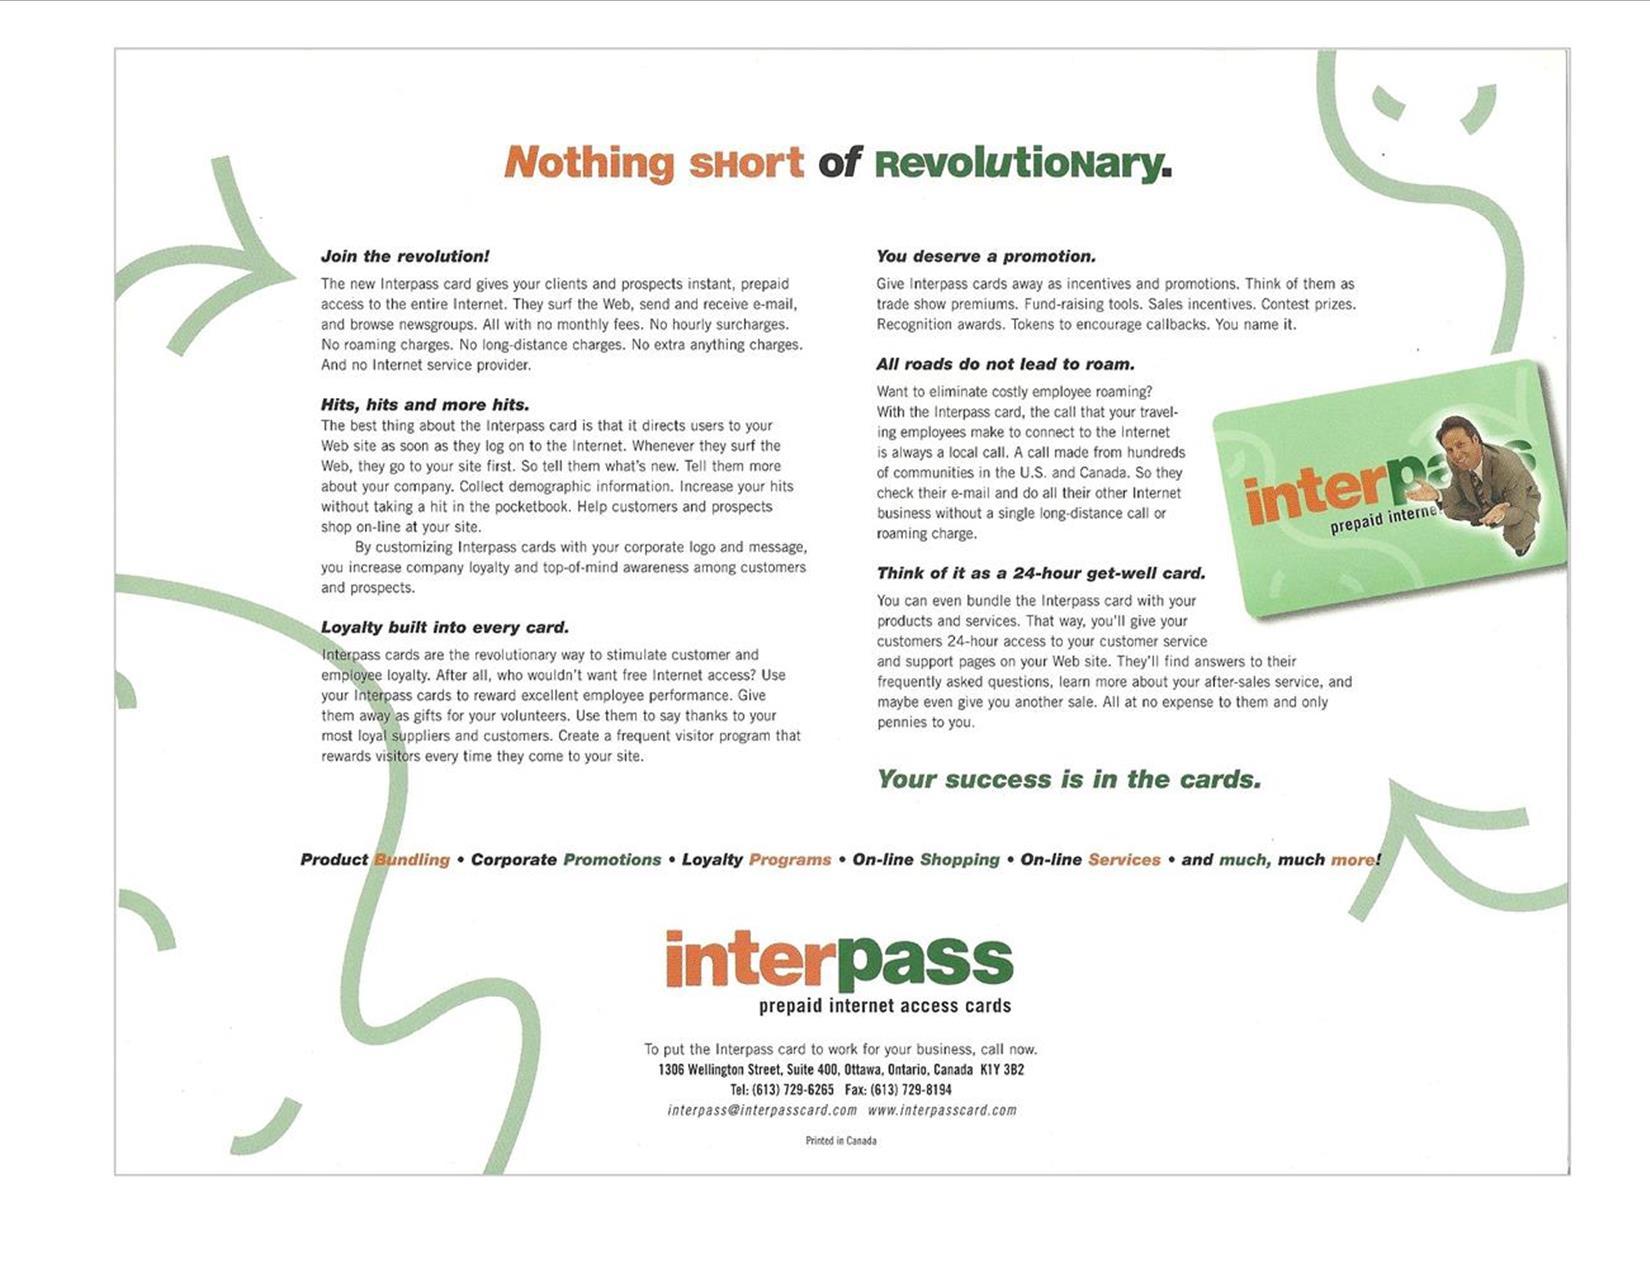 InterPass 2 of 2